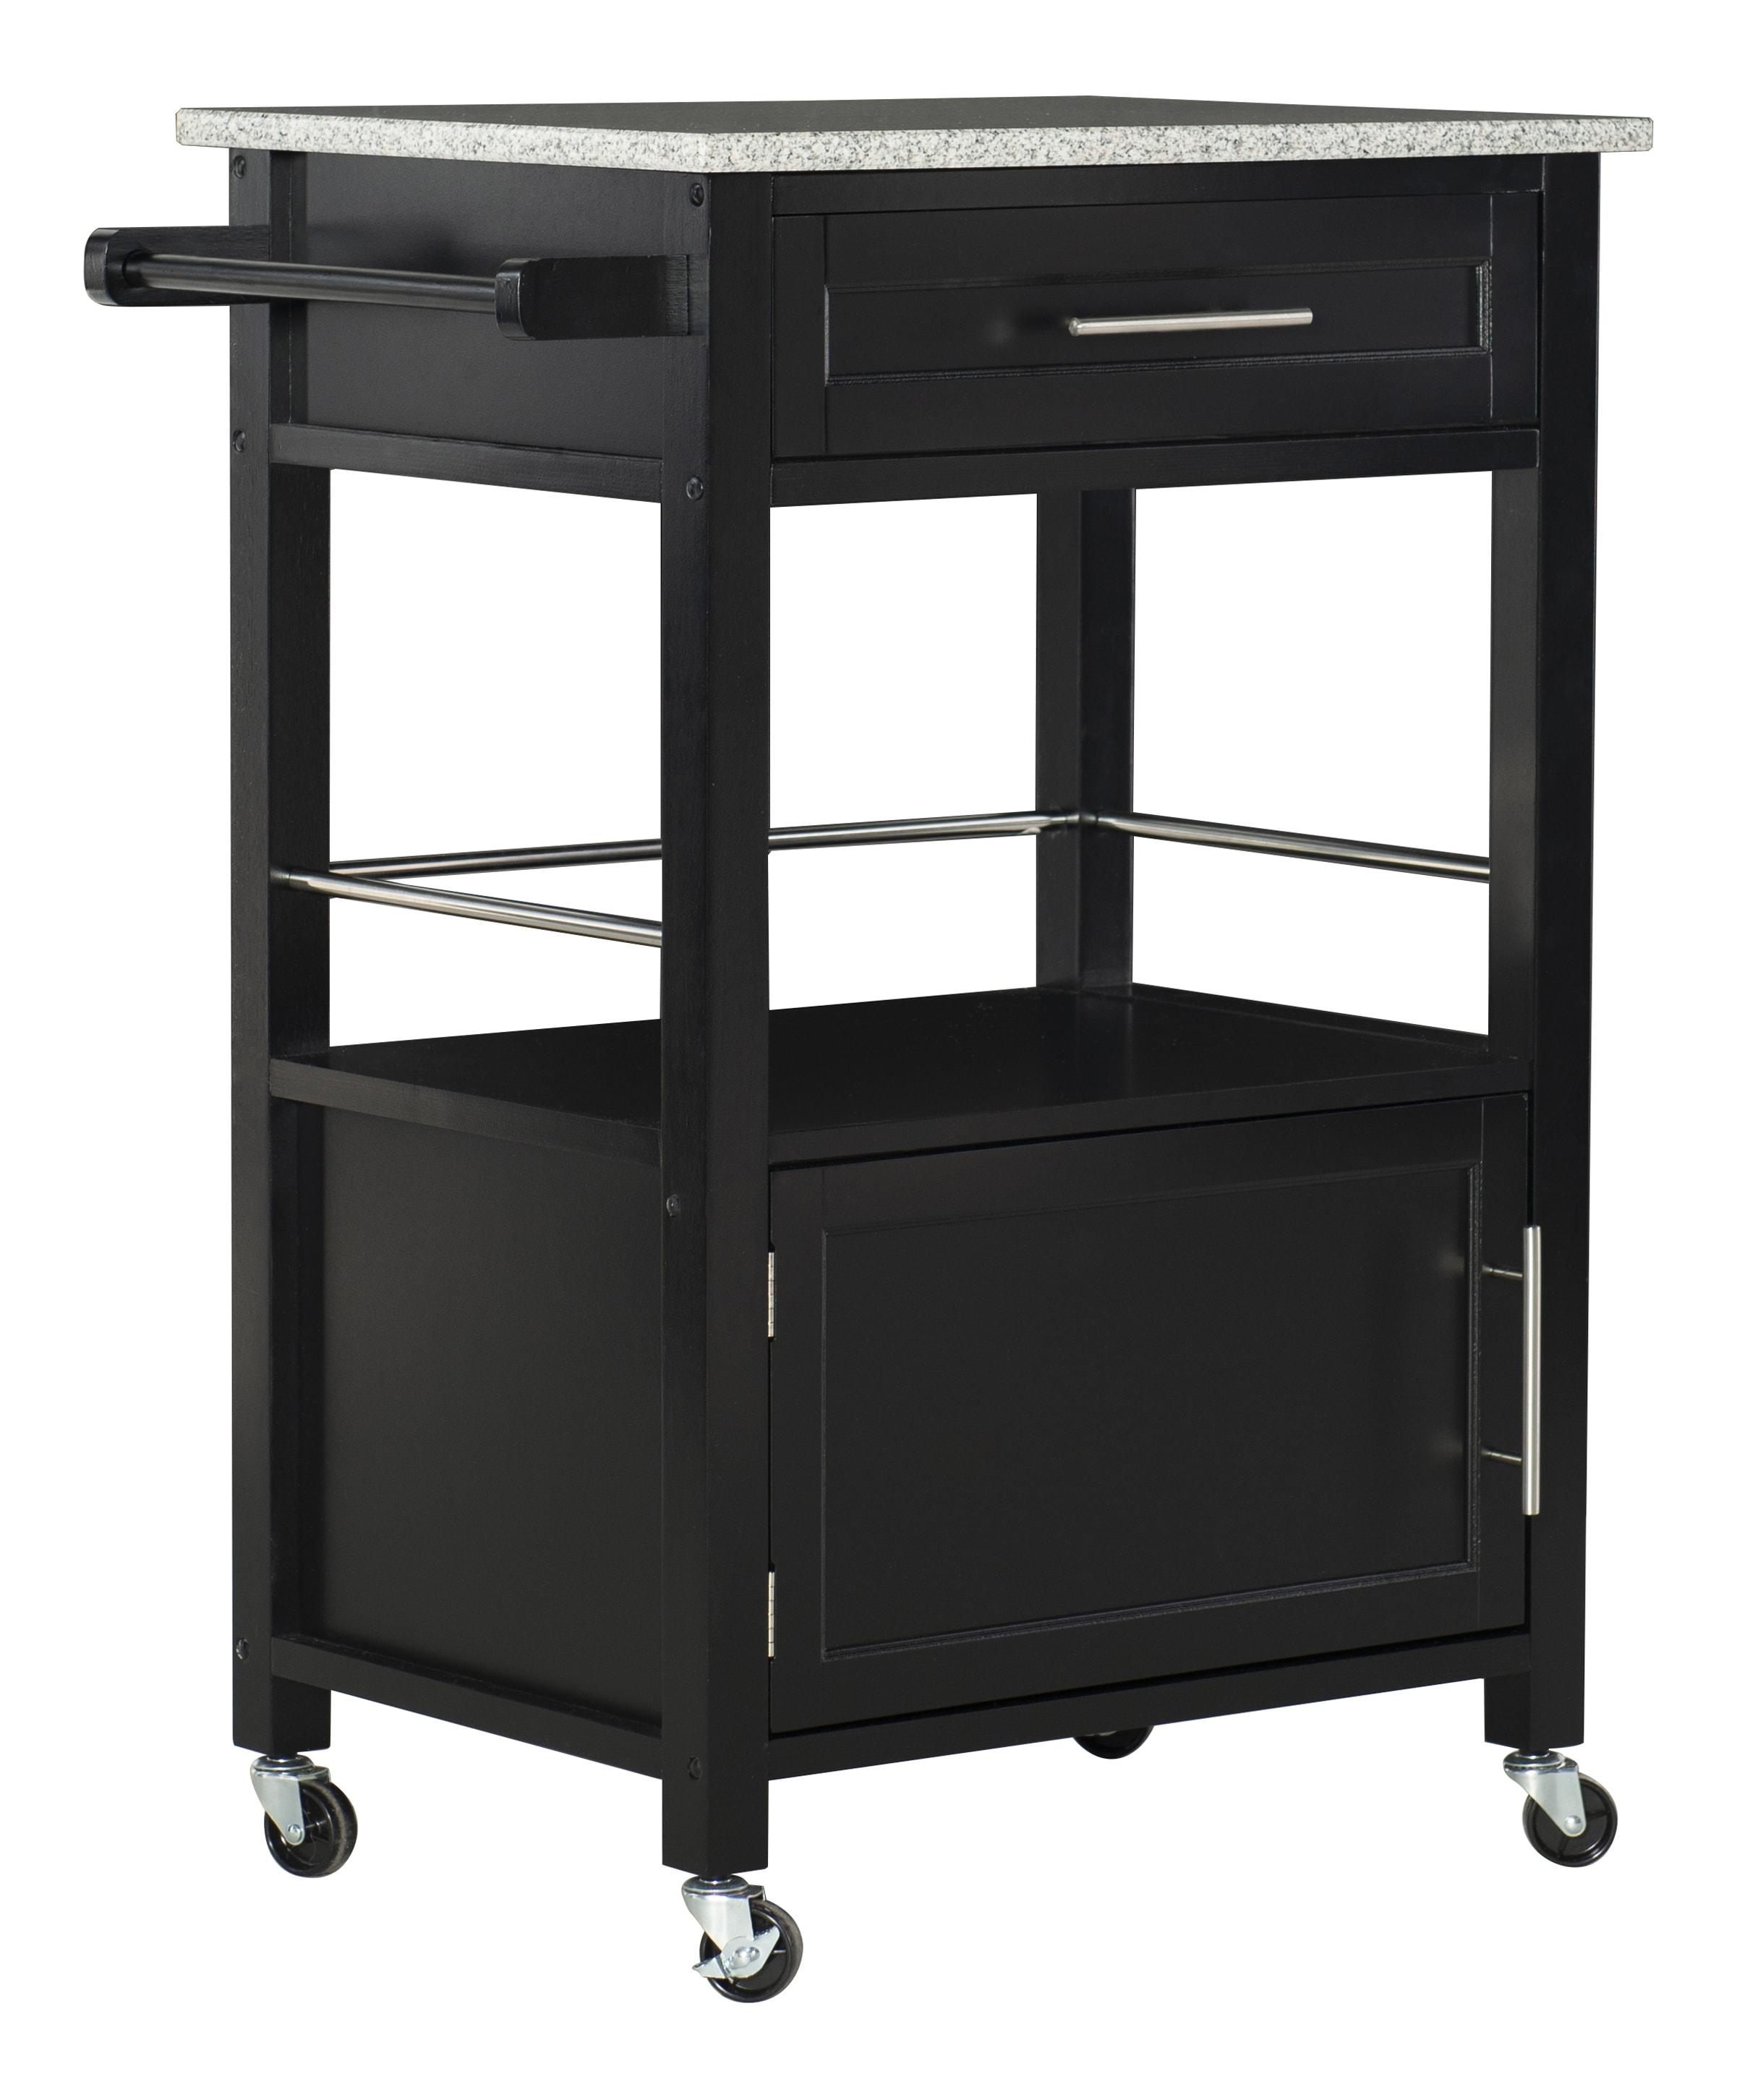 "Linon Clark Granite-Top Kitchen Cart, 36""H x 27-1/4""W x 18""D, Black"